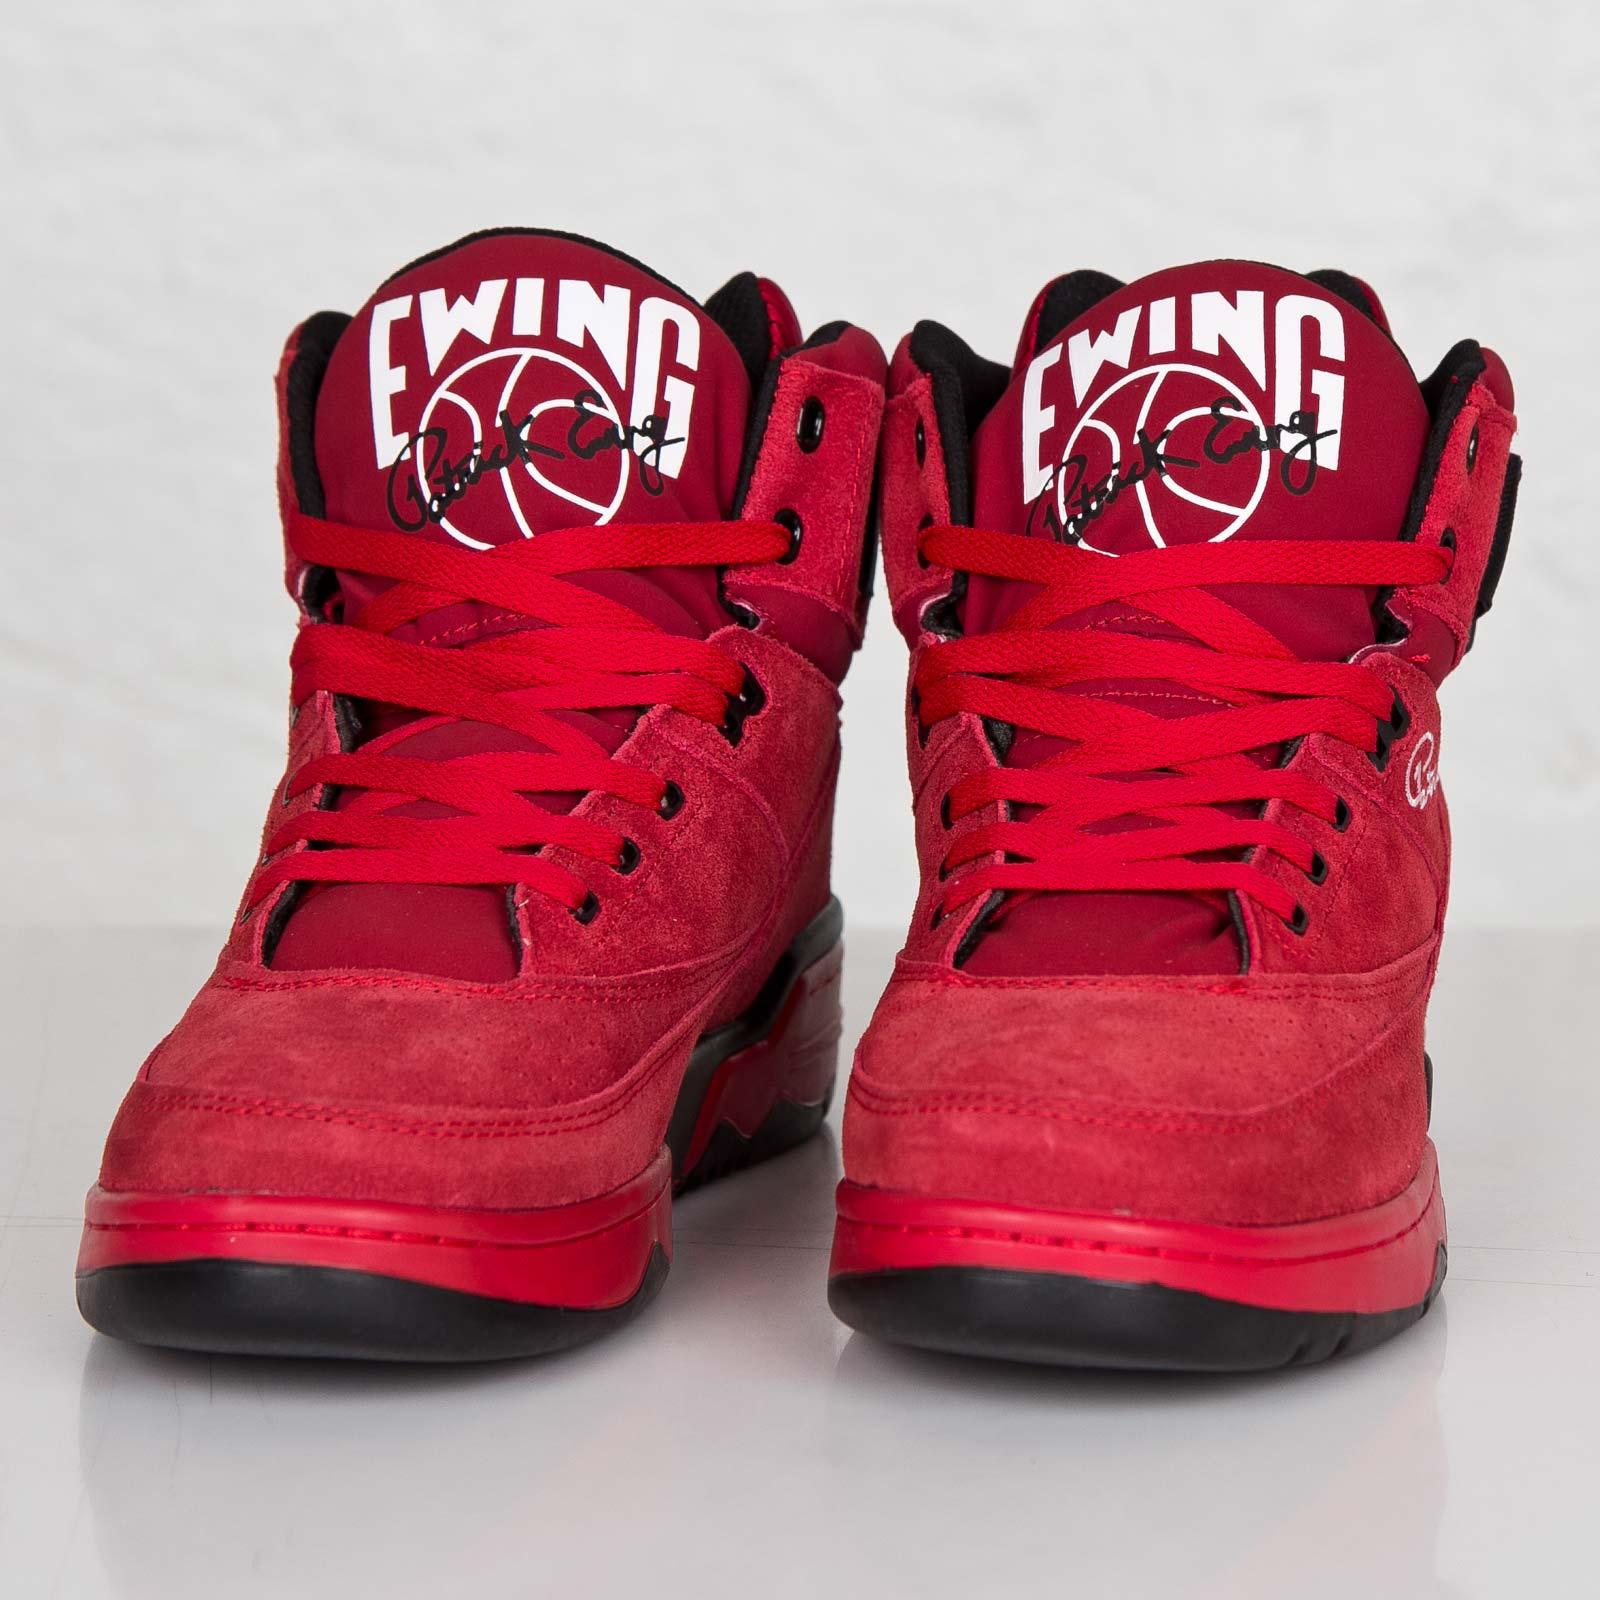 57b05539980 Ewing Athletics Ewing 33 Hi - 1ew90013-601 - Sneakersnstuff ...